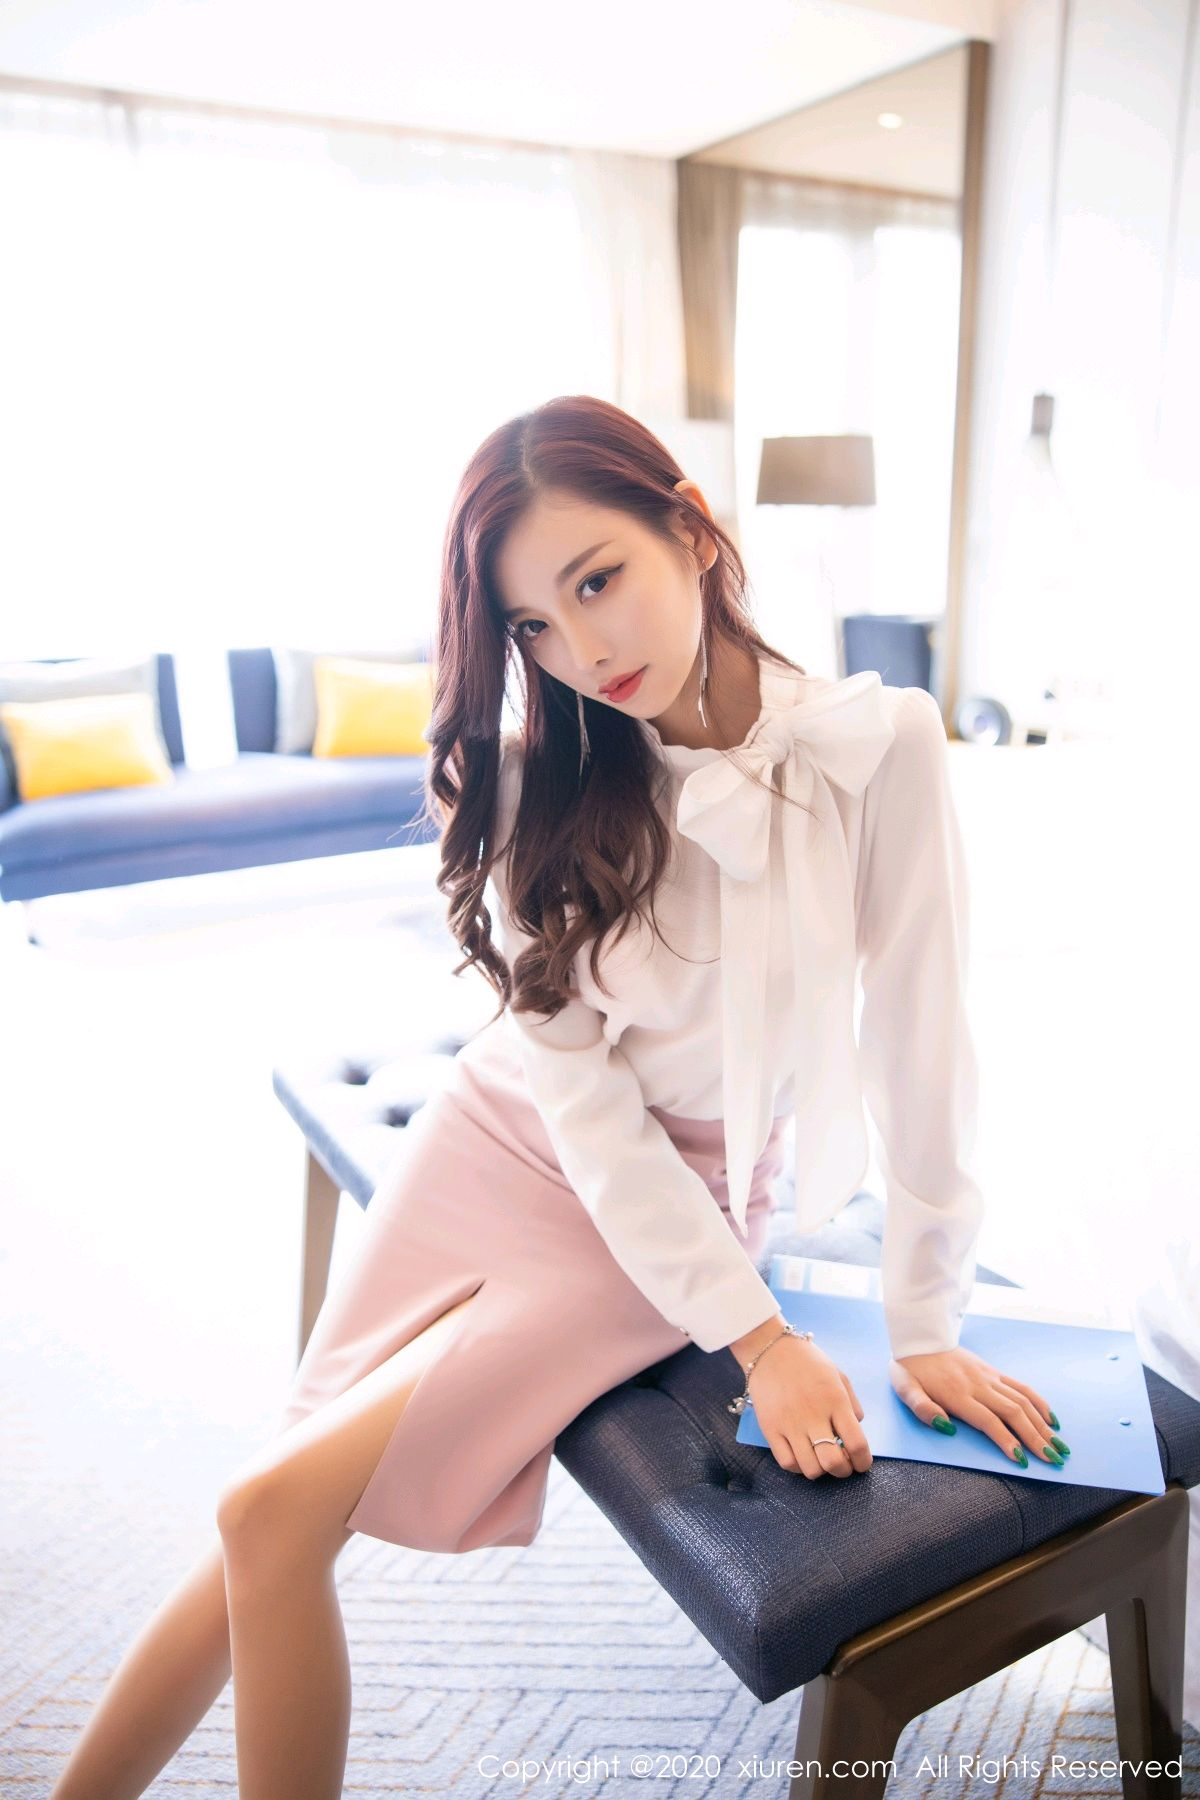 [XiuRen] Vol.2431 Yang Chen Chen 11P, Tall, Underwear, Uniform, Xiuren, Yang Chen Chen